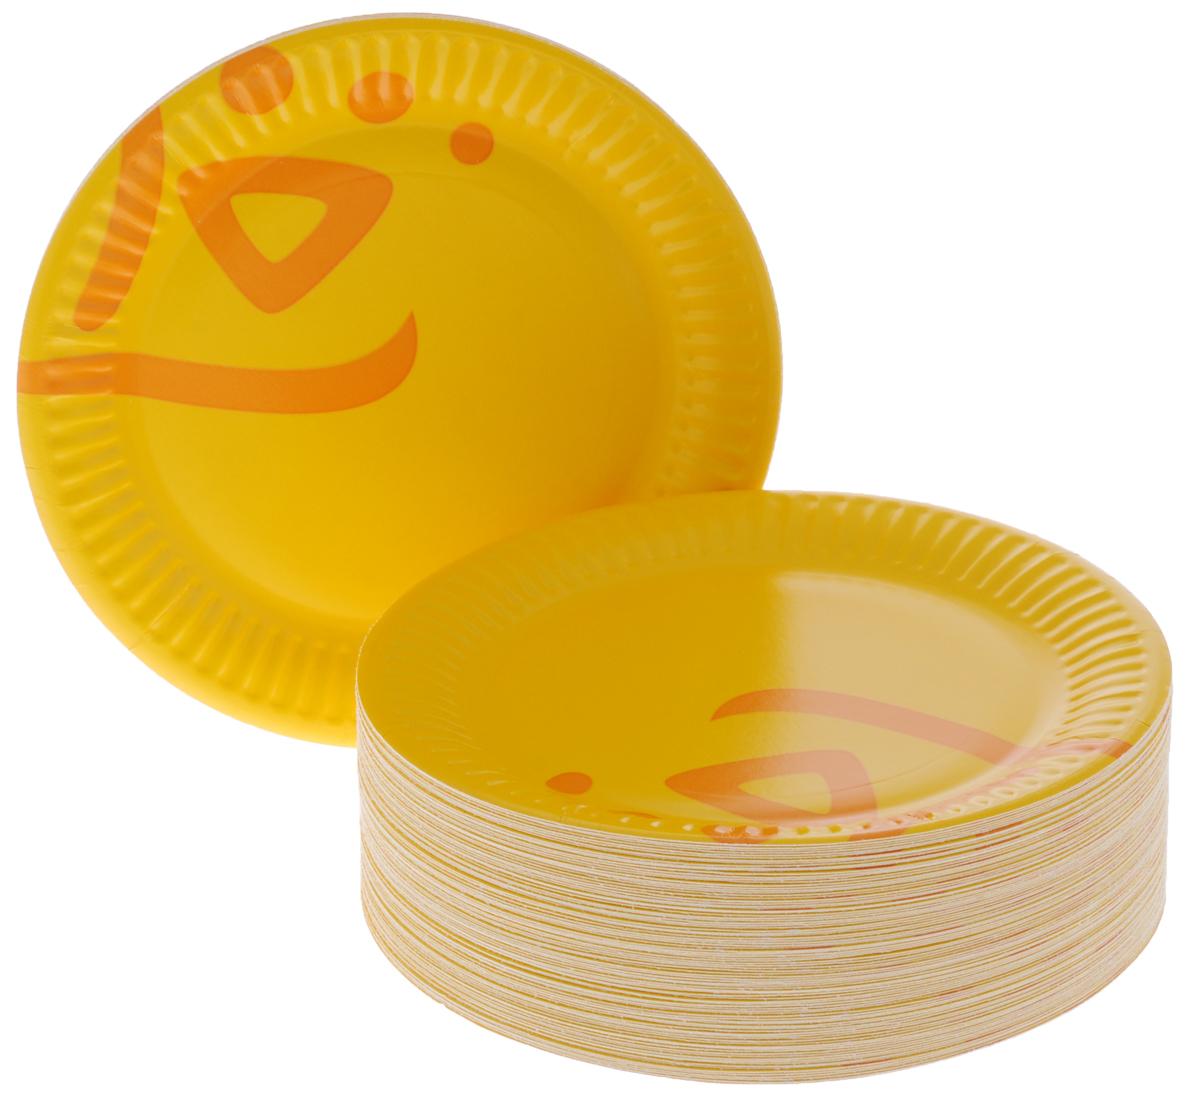 Набор одноразовых тарелок Huhtamaki Whizz, цвет: оранжевый, диаметр 15 см, 100 шт